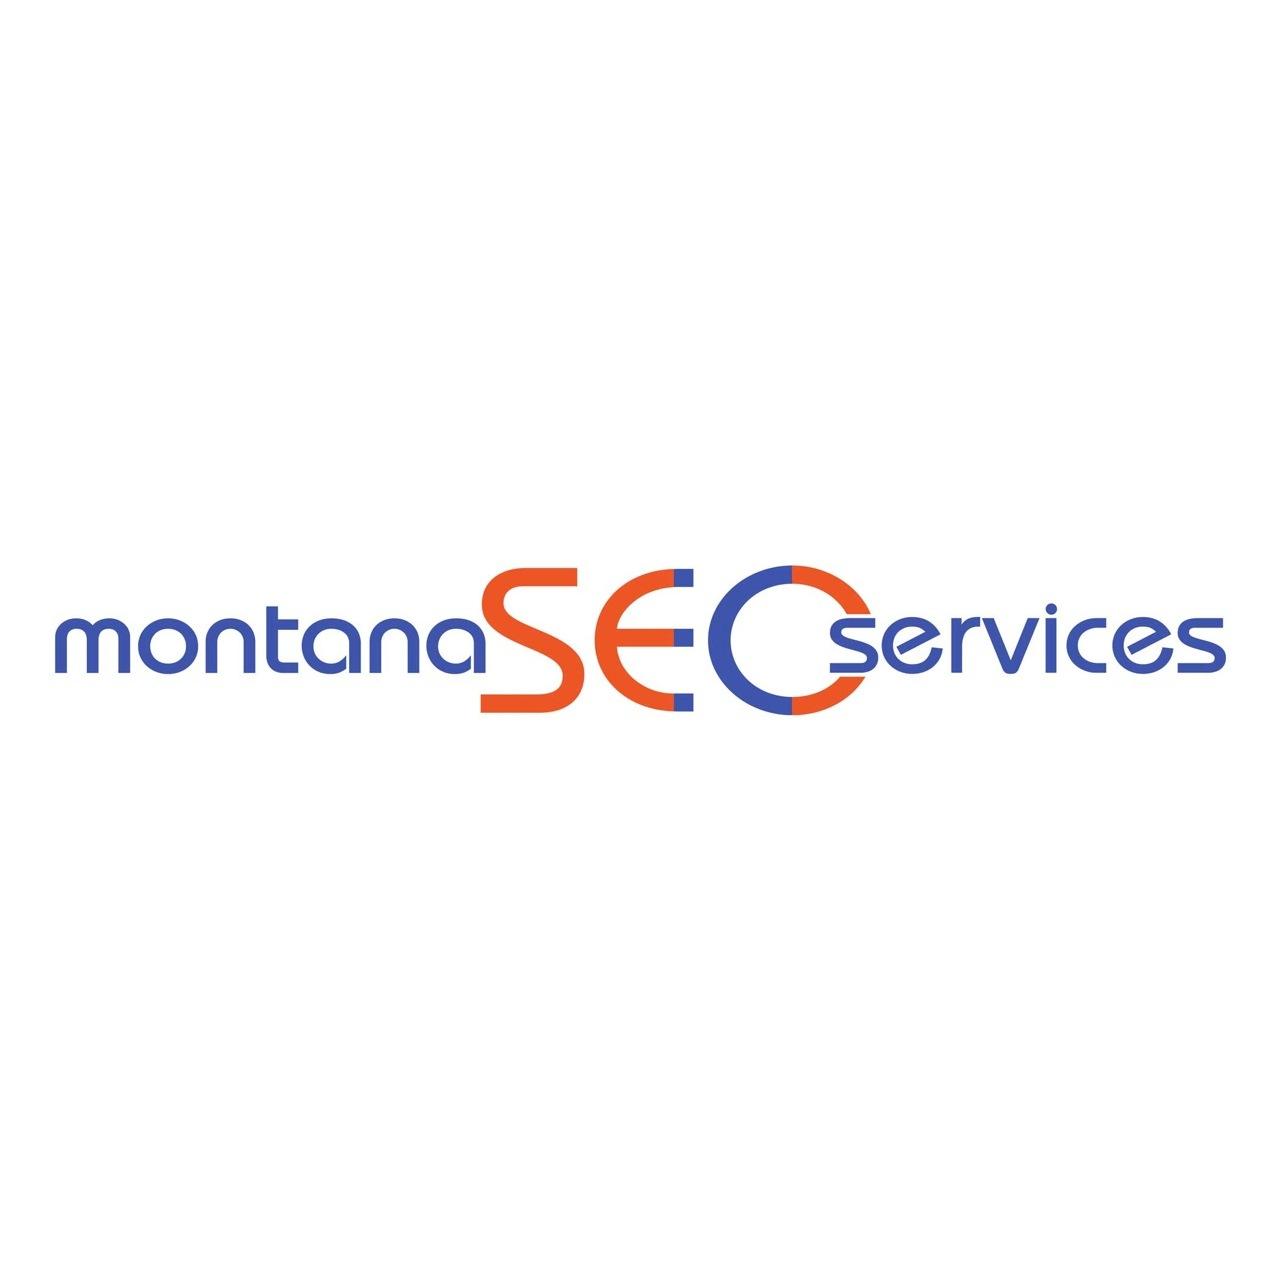 Montana SEO Services